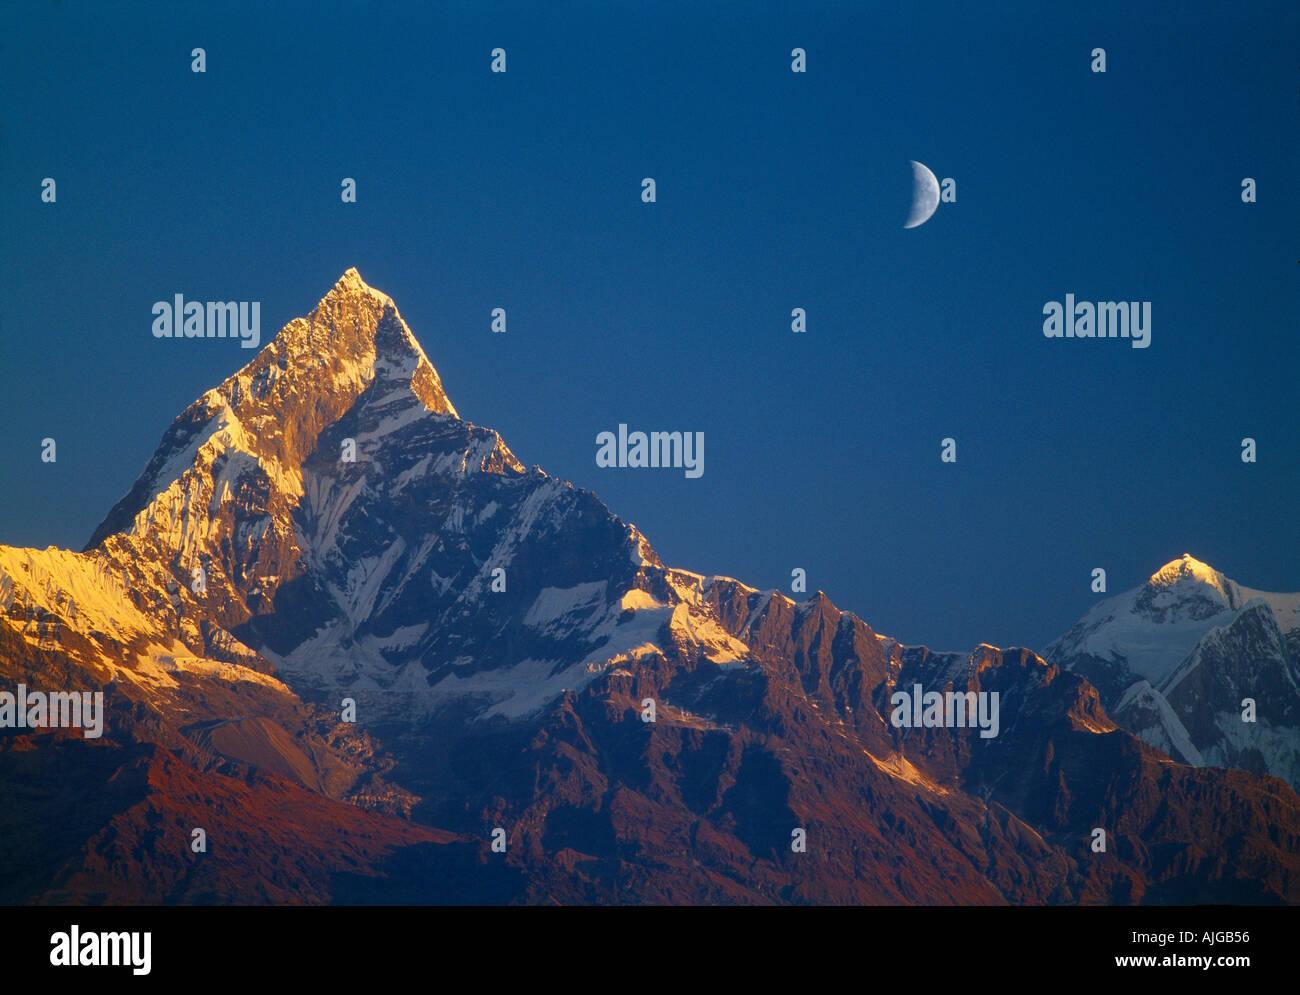 Anzeigen Fishtail Heiliger Berg mit dem Mond Annapurna Himalaya Nepal Stockfoto